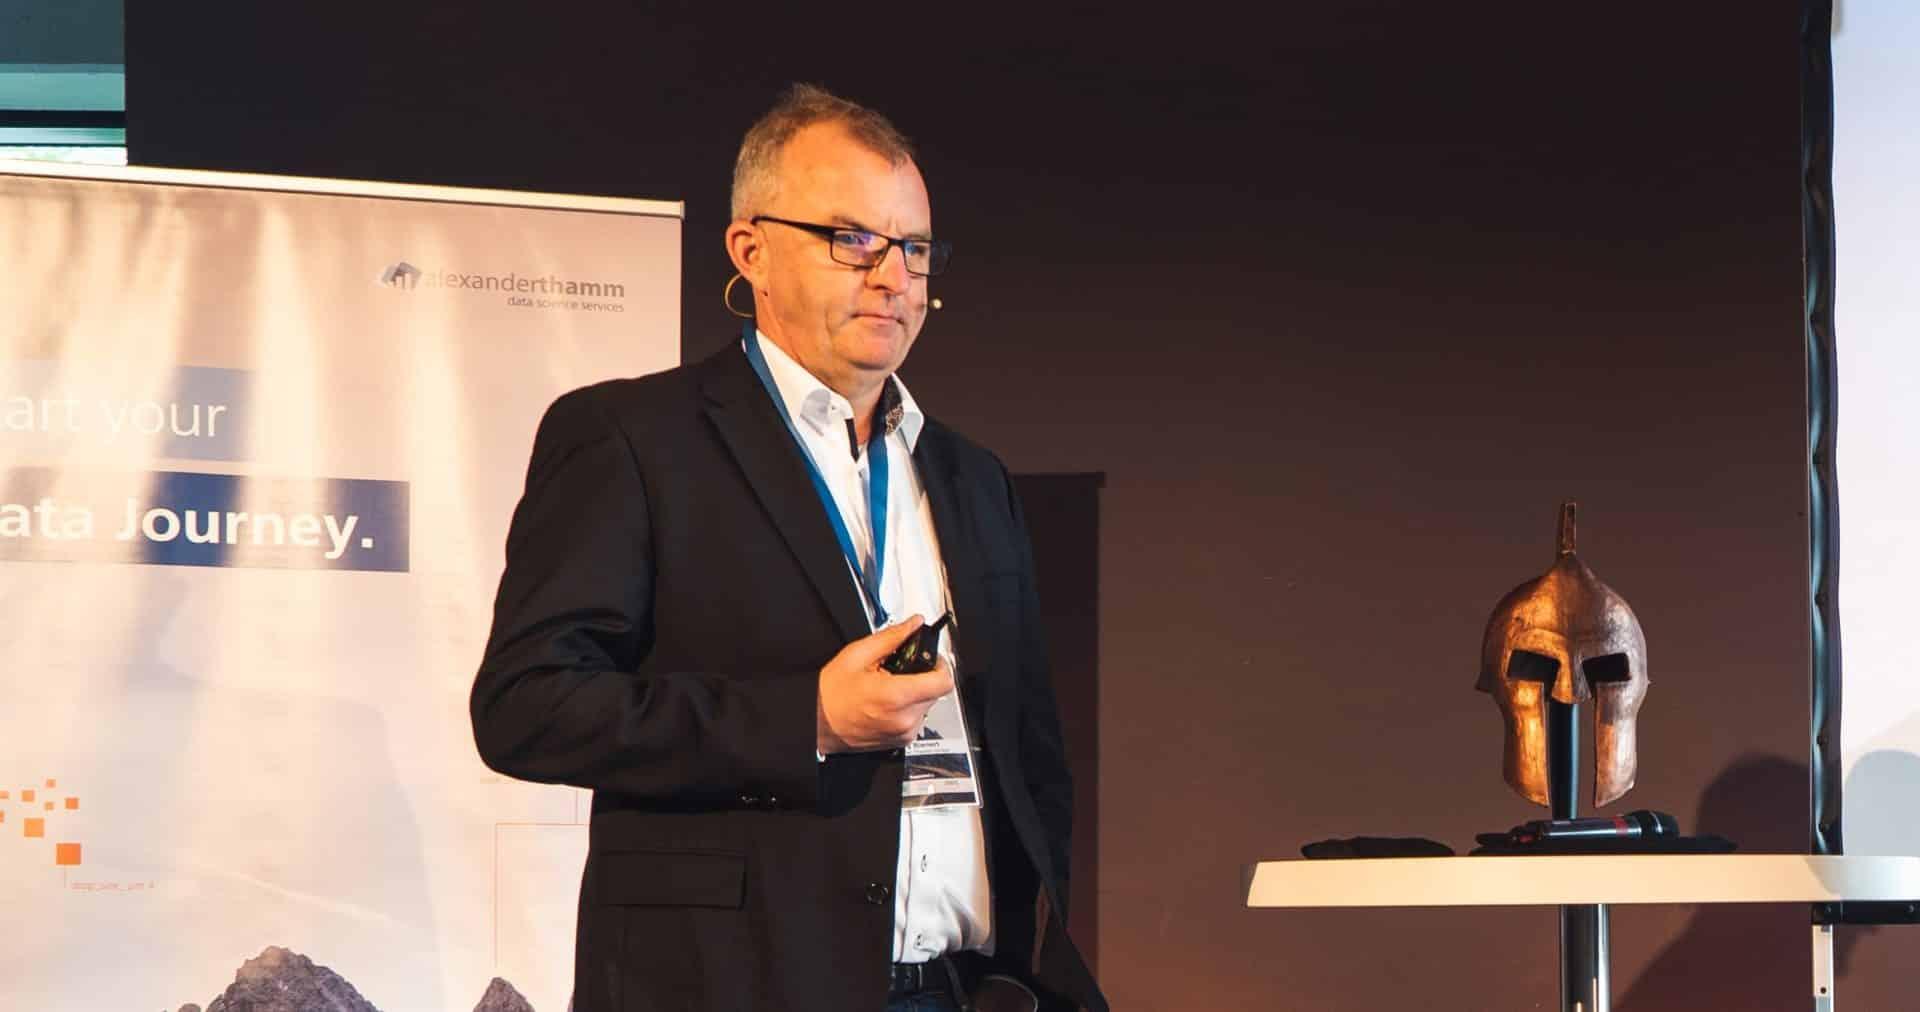 Jörg Bienert_Partner der Alexander Thamm GmbH